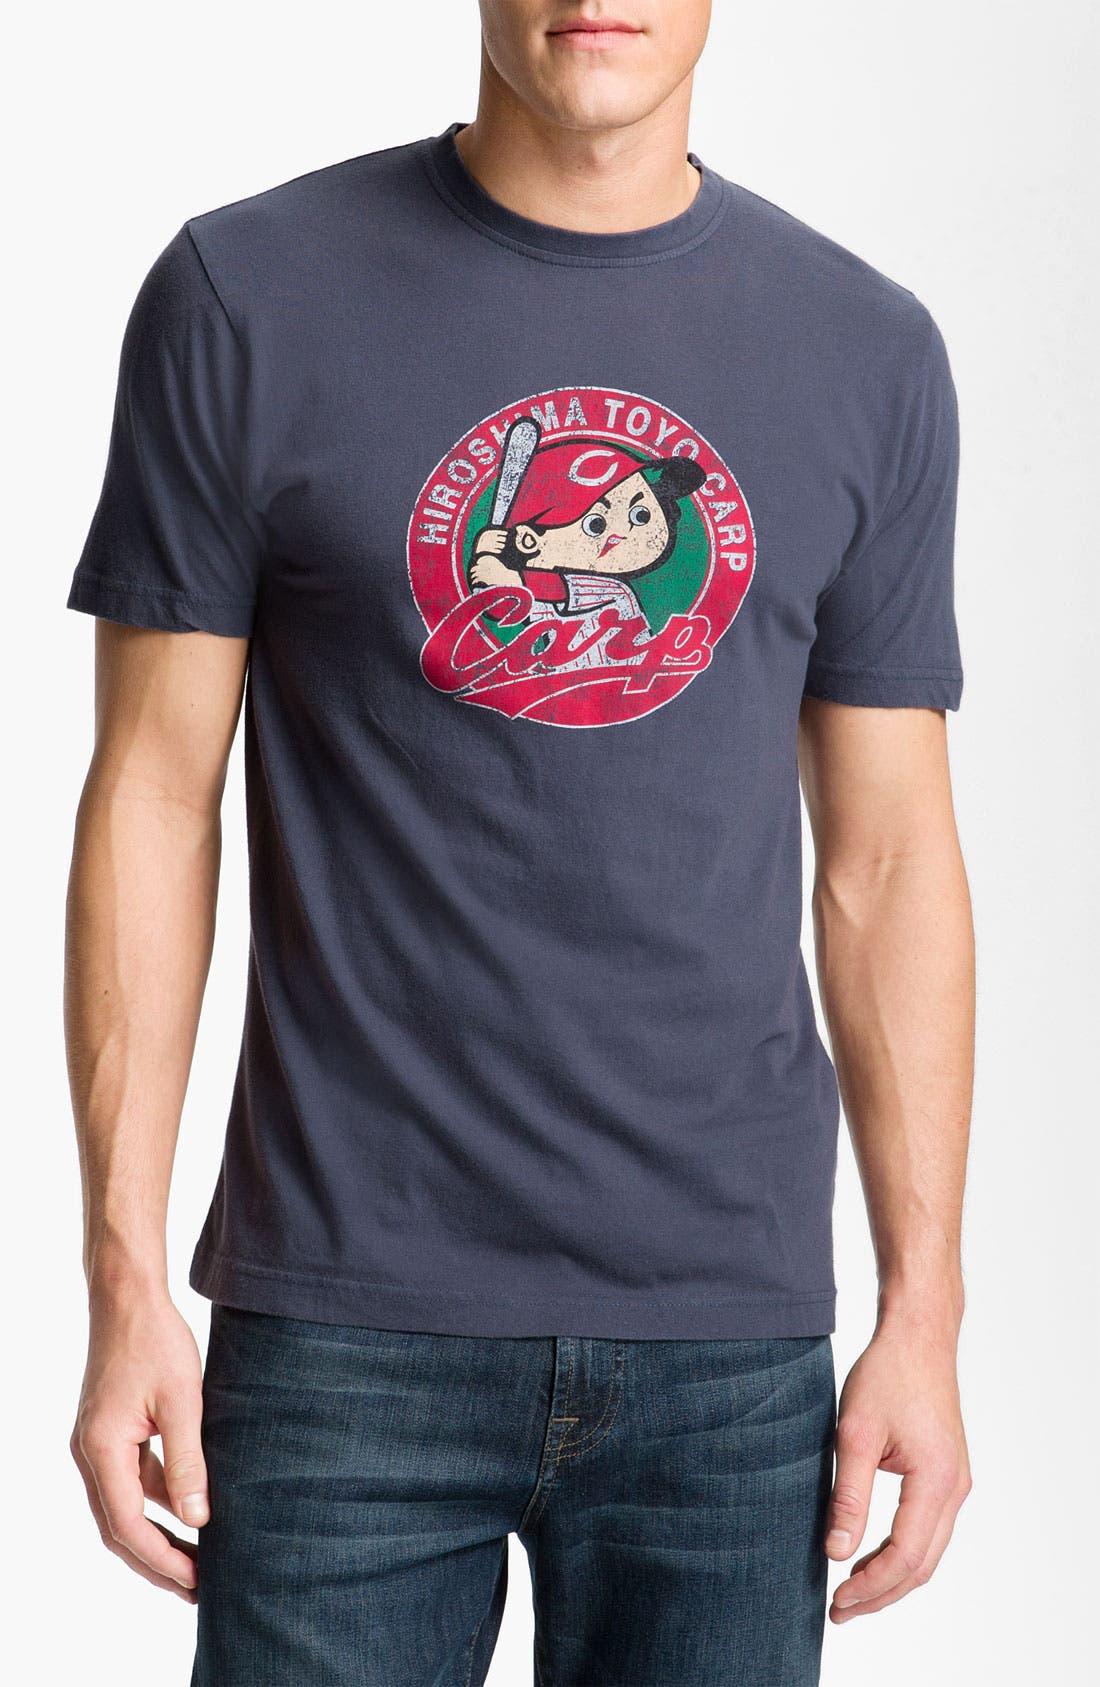 Alternate Image 1 Selected - Red Jacket 'Hiroshima Carps - Brass Tack' T-Shirt (Men)